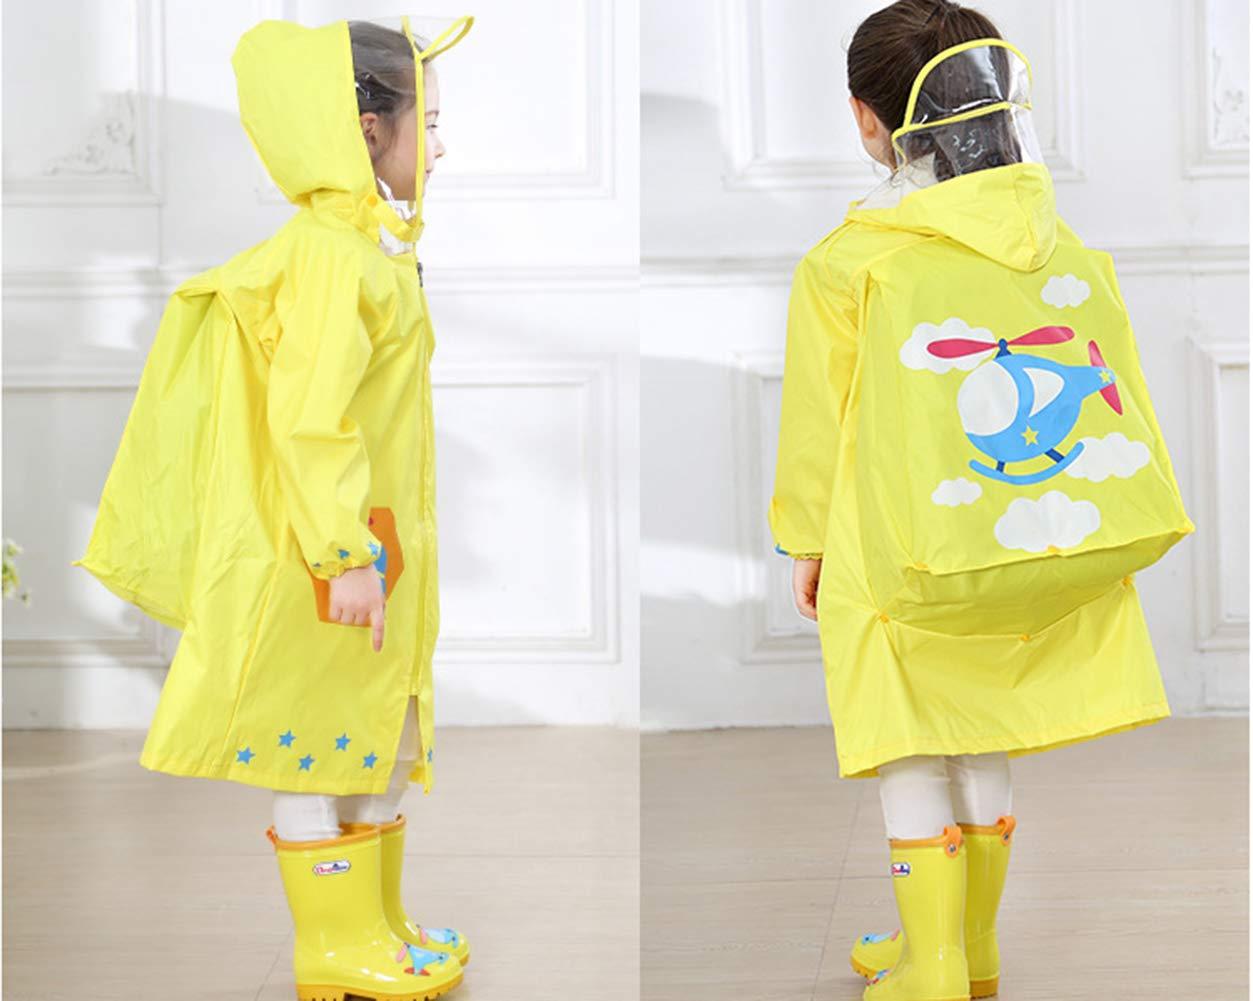 Flairstar Poncho Chubasquero Impermeable de Escuela Niño Niños con Capucha Impermeable Aire Libre 2